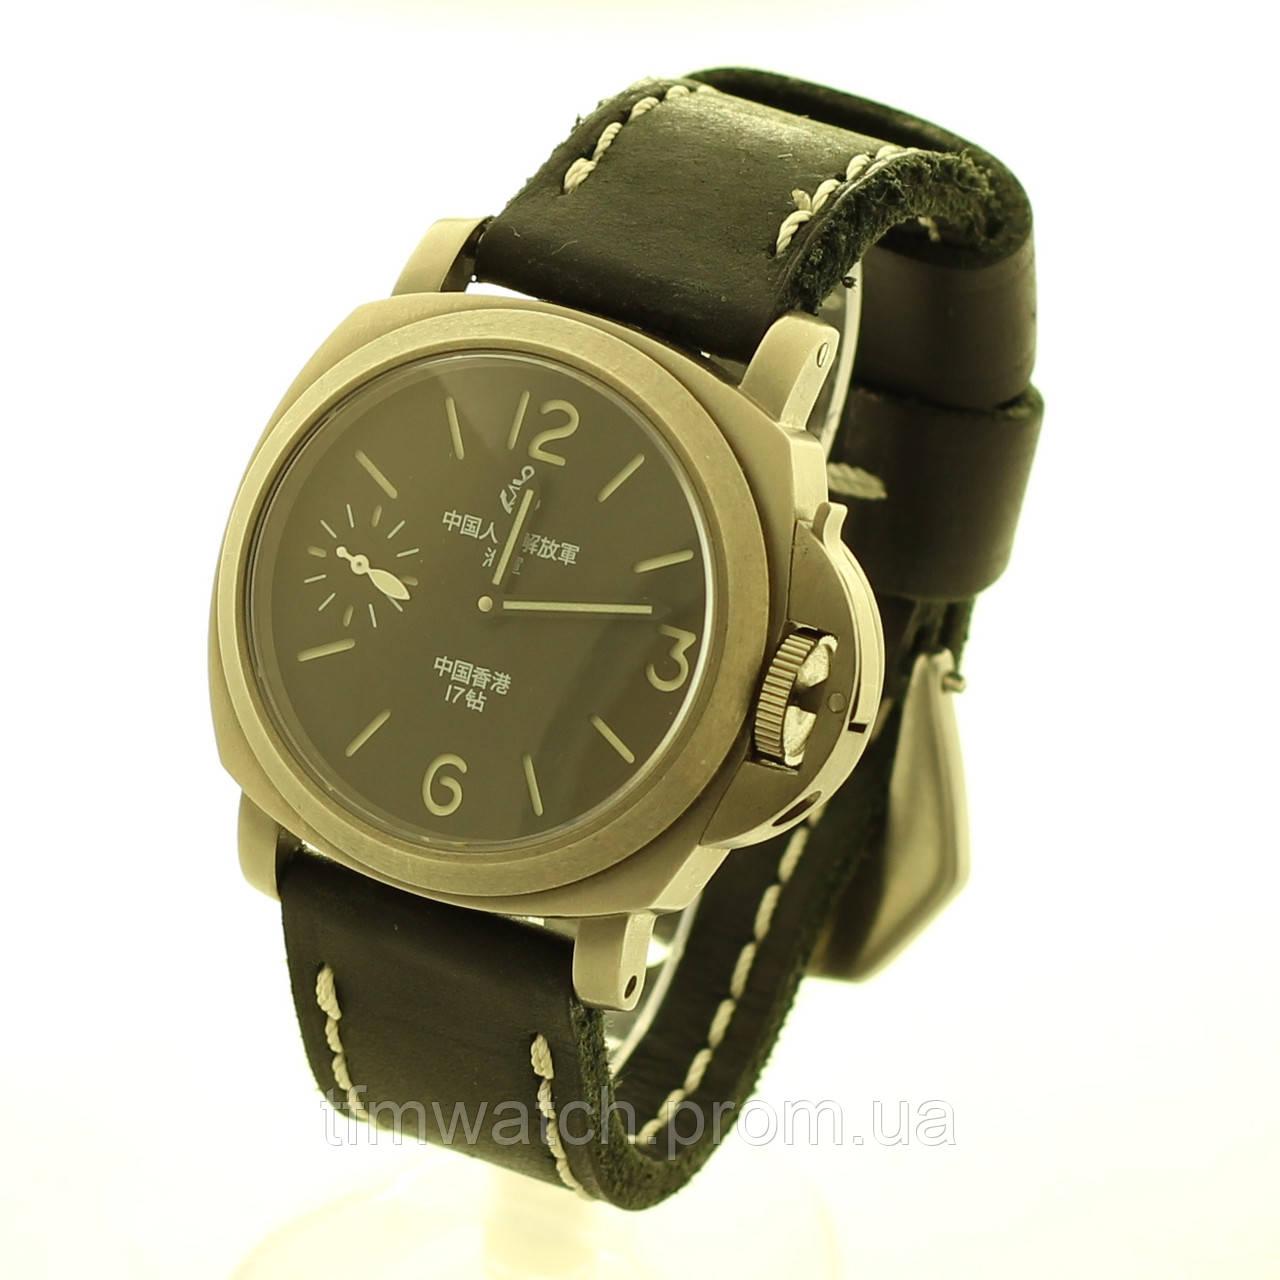 Getat Watch limited edition наручные часы